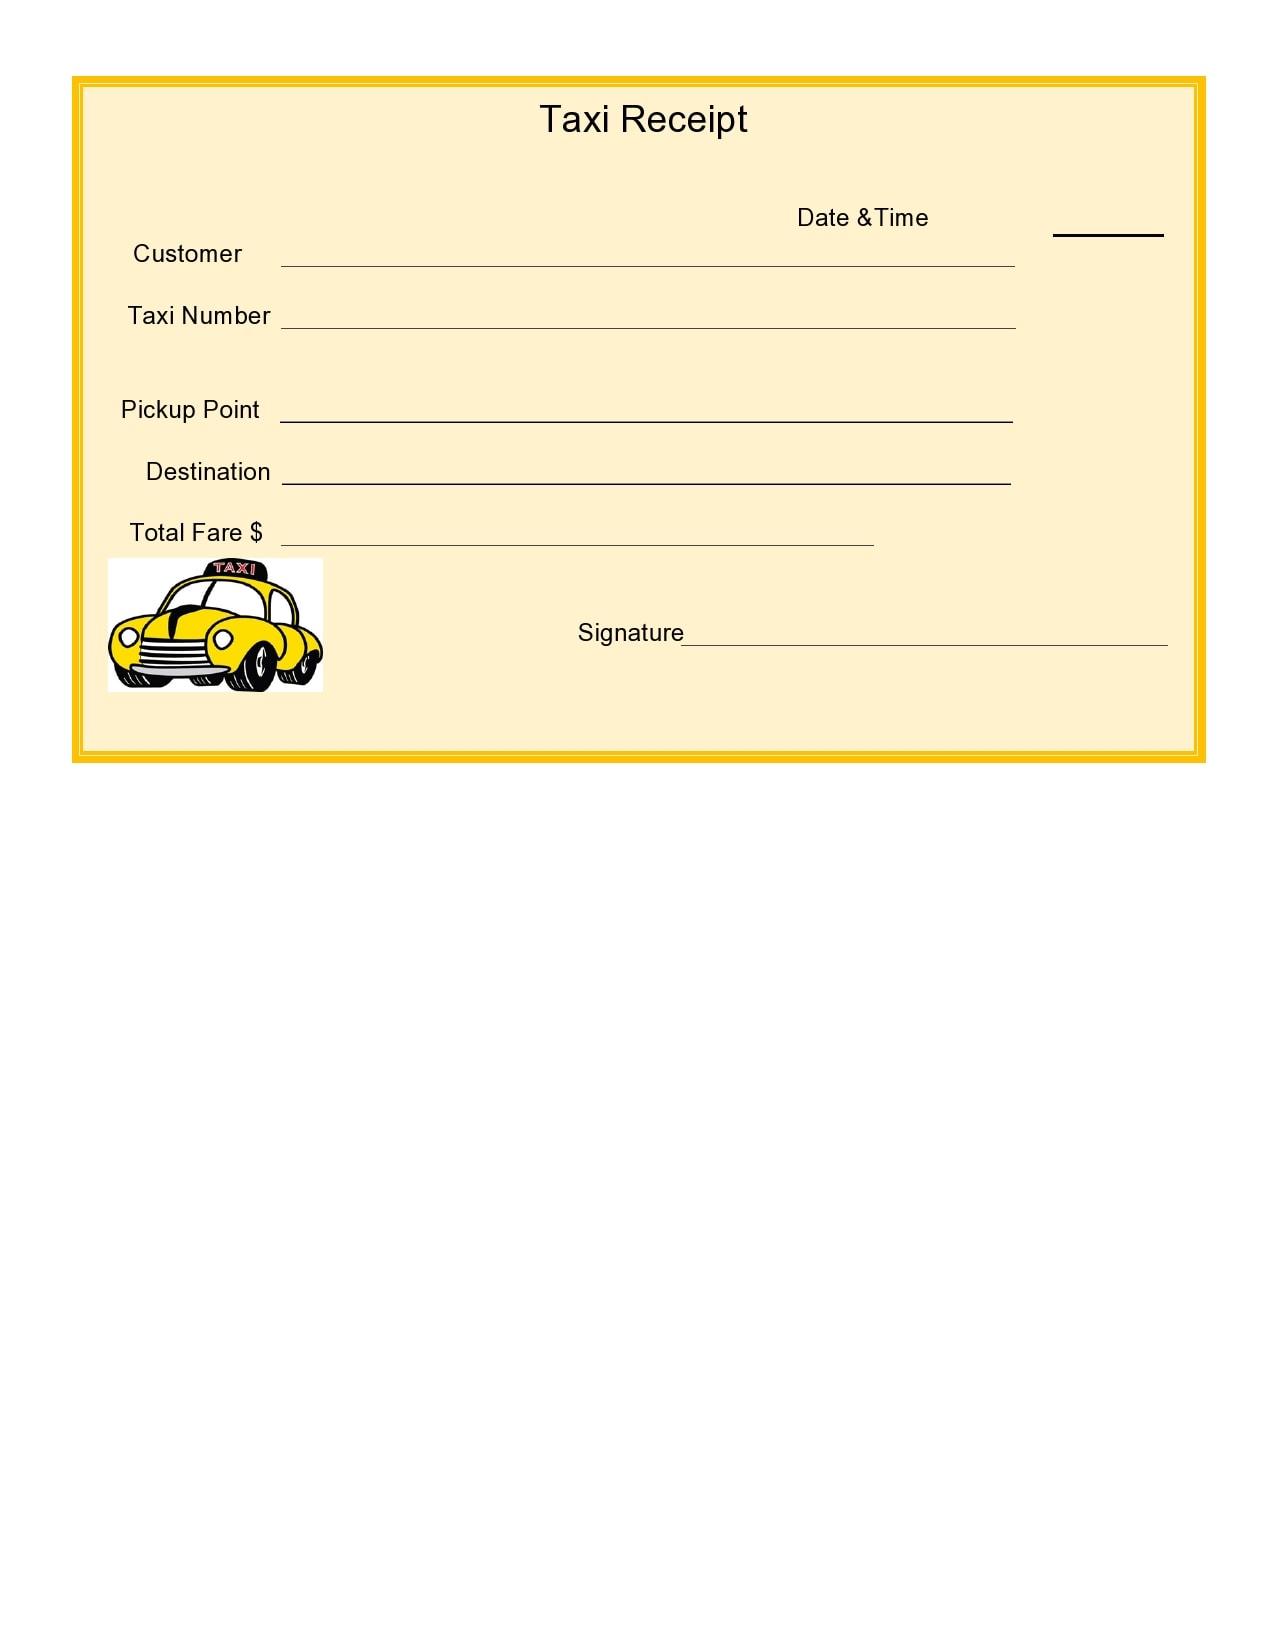 taxi receipt 27